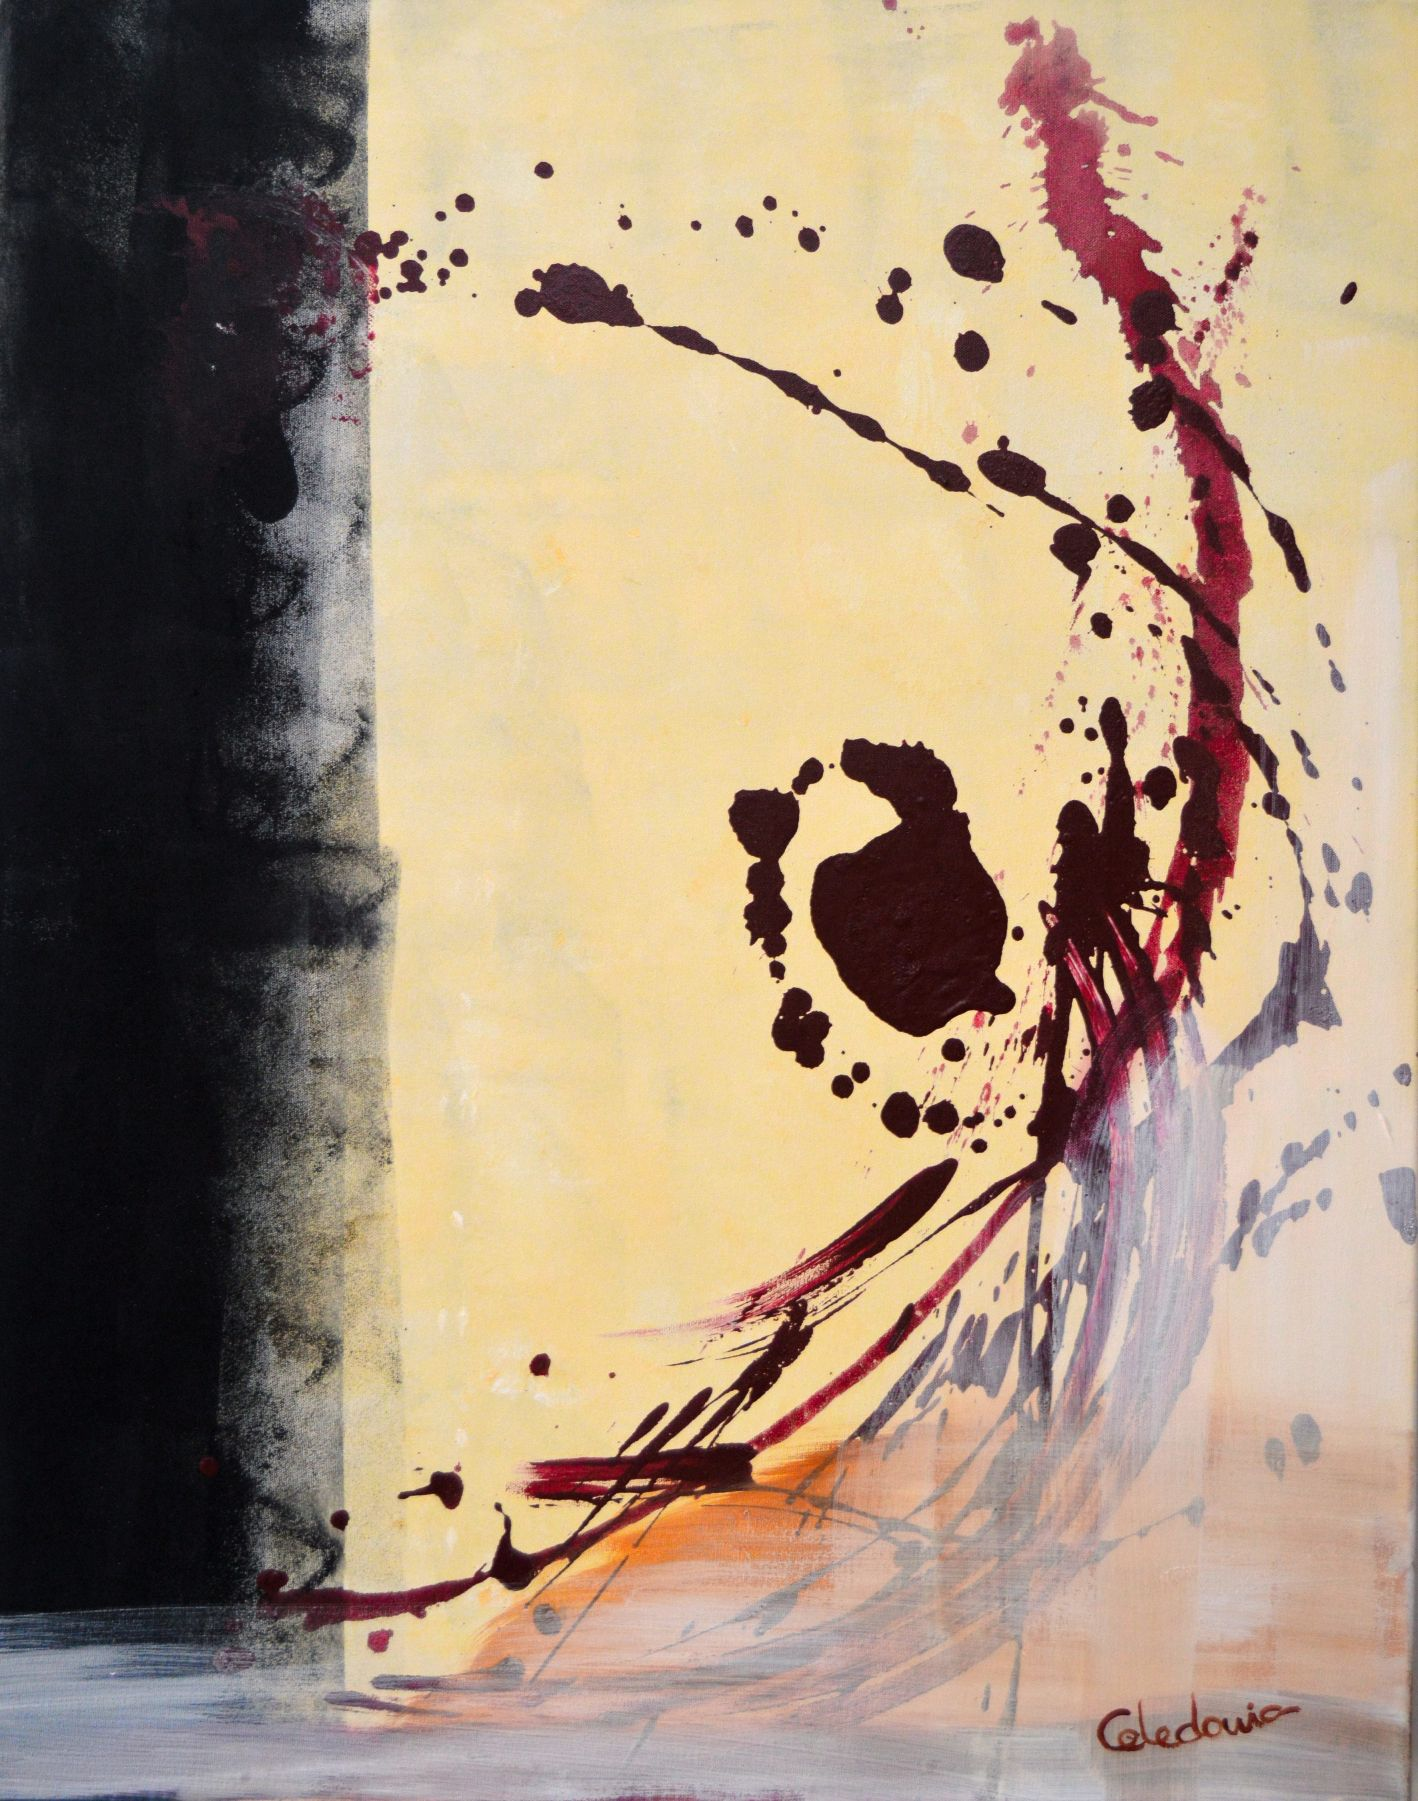 Sin título I (2009) - Celedonia Ramón Muro